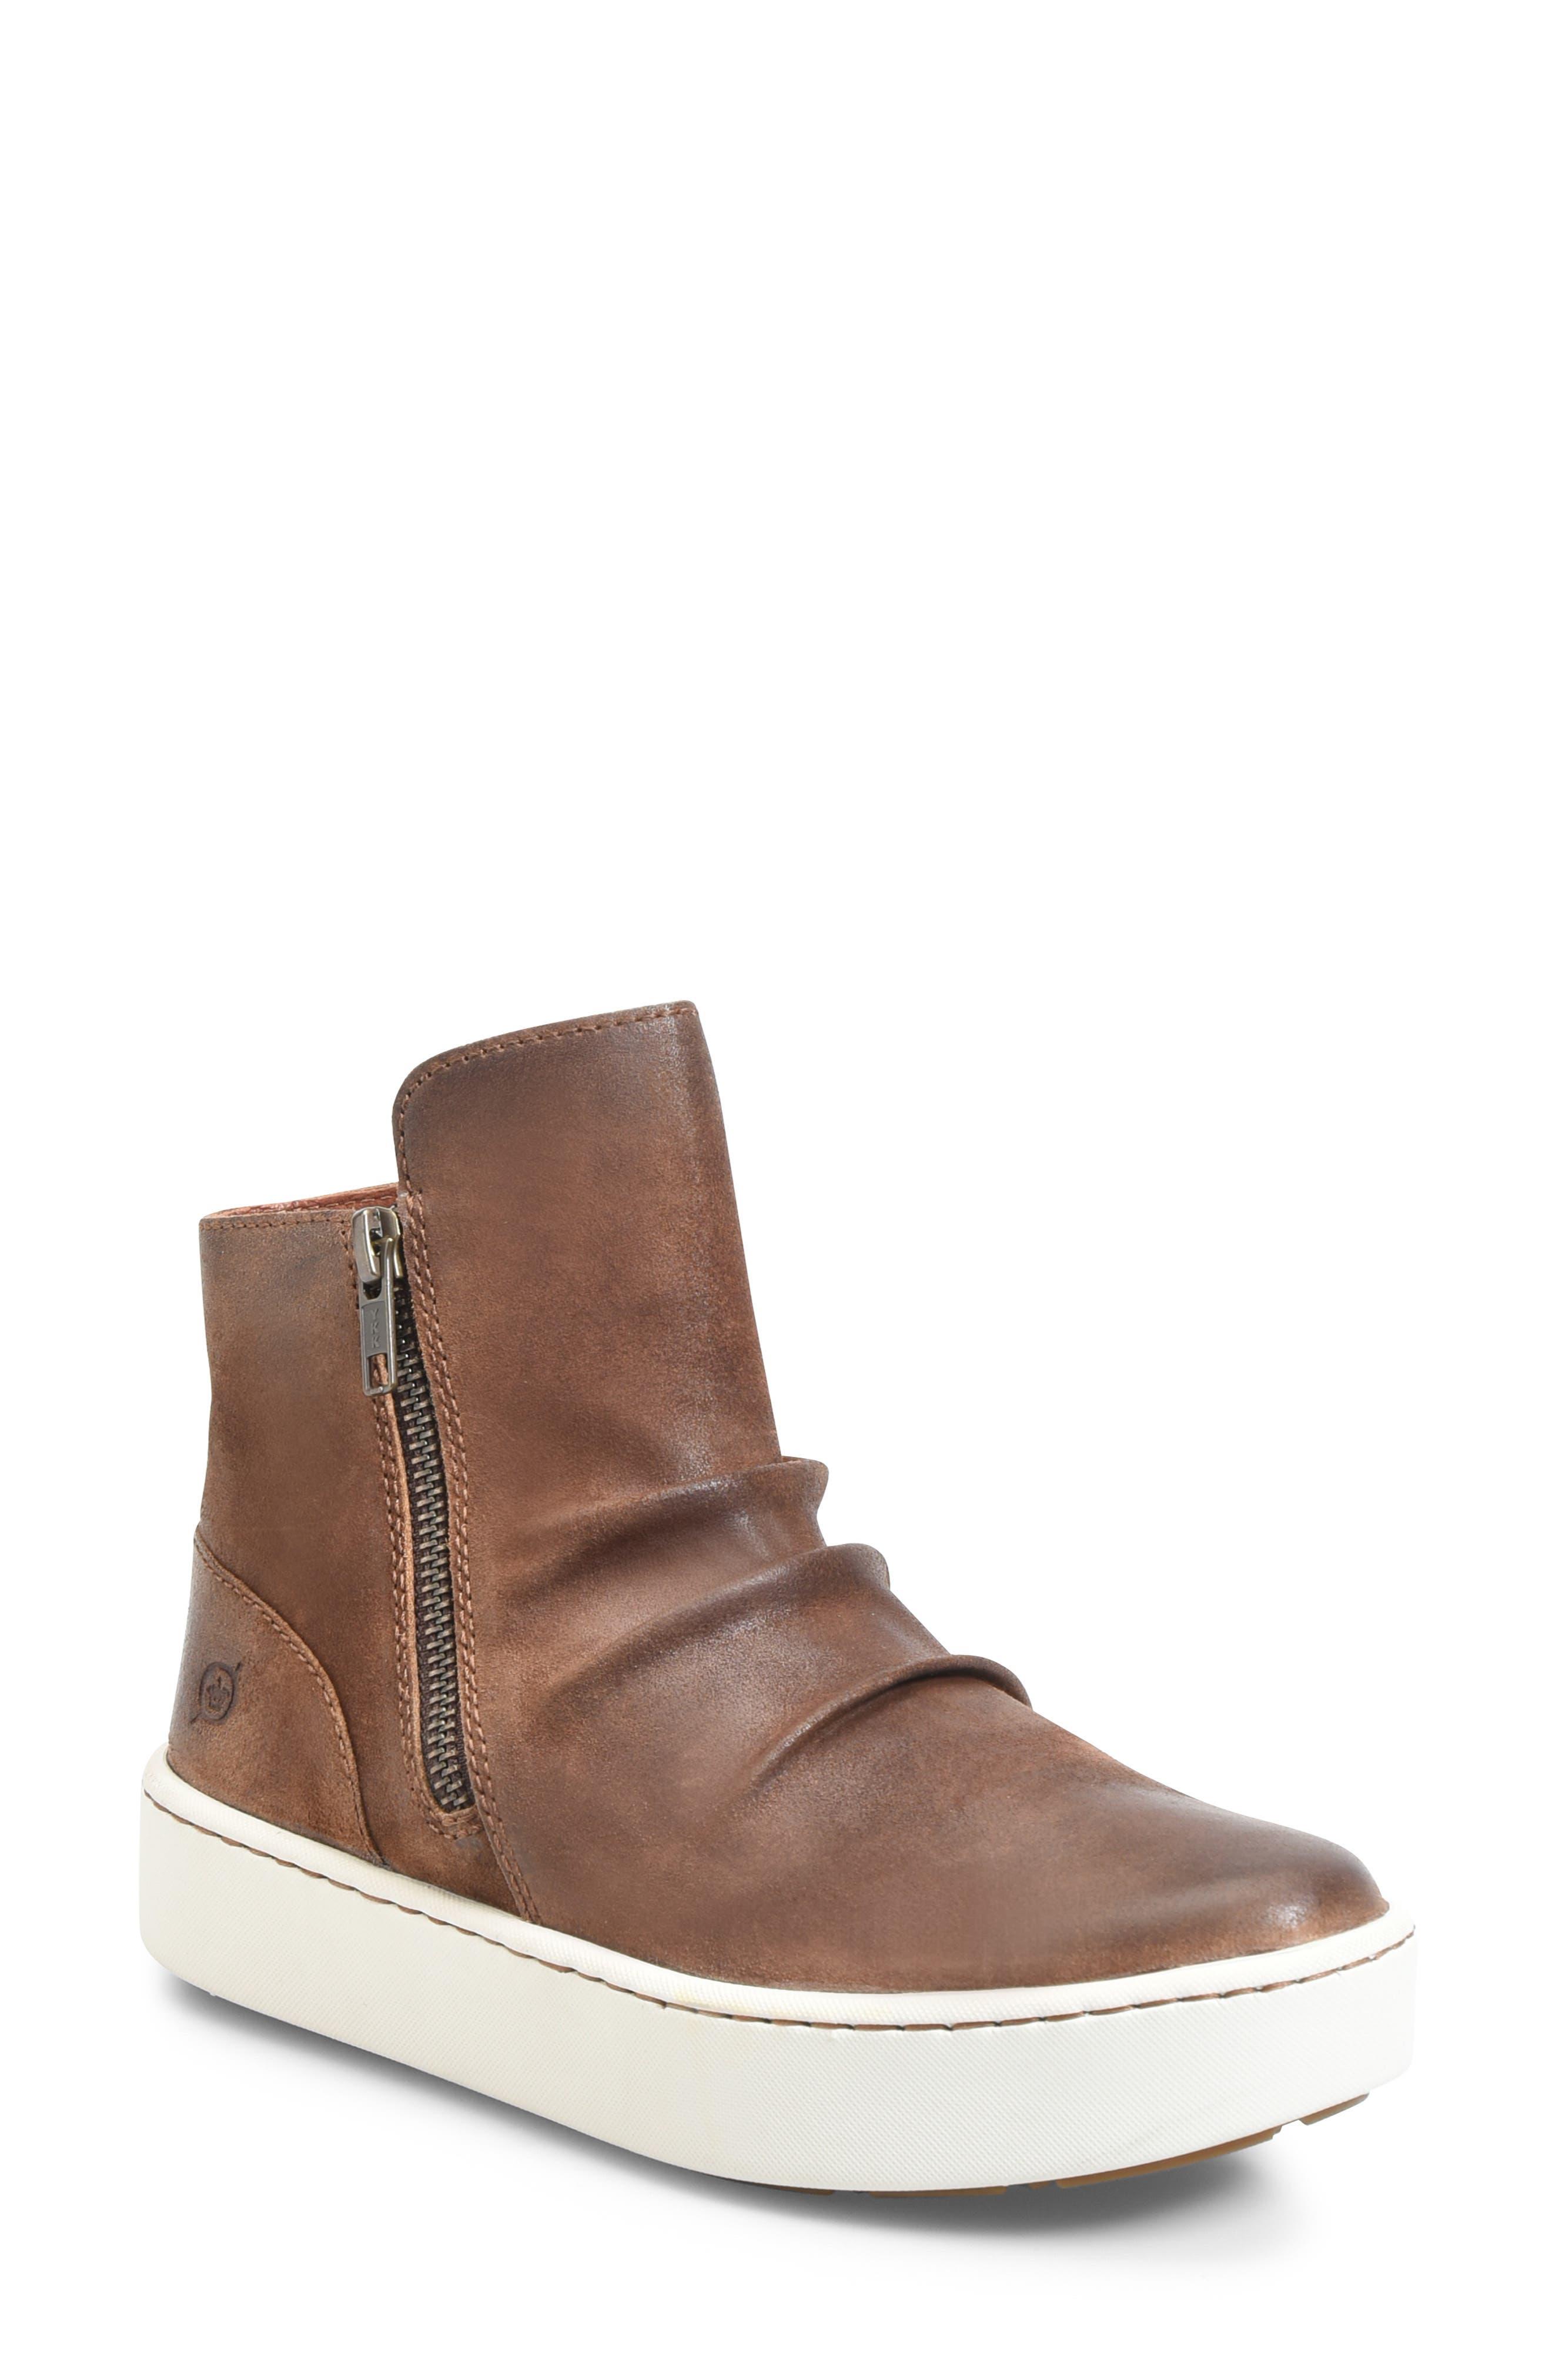 B?rn Scone Sneaker Boot, Brown